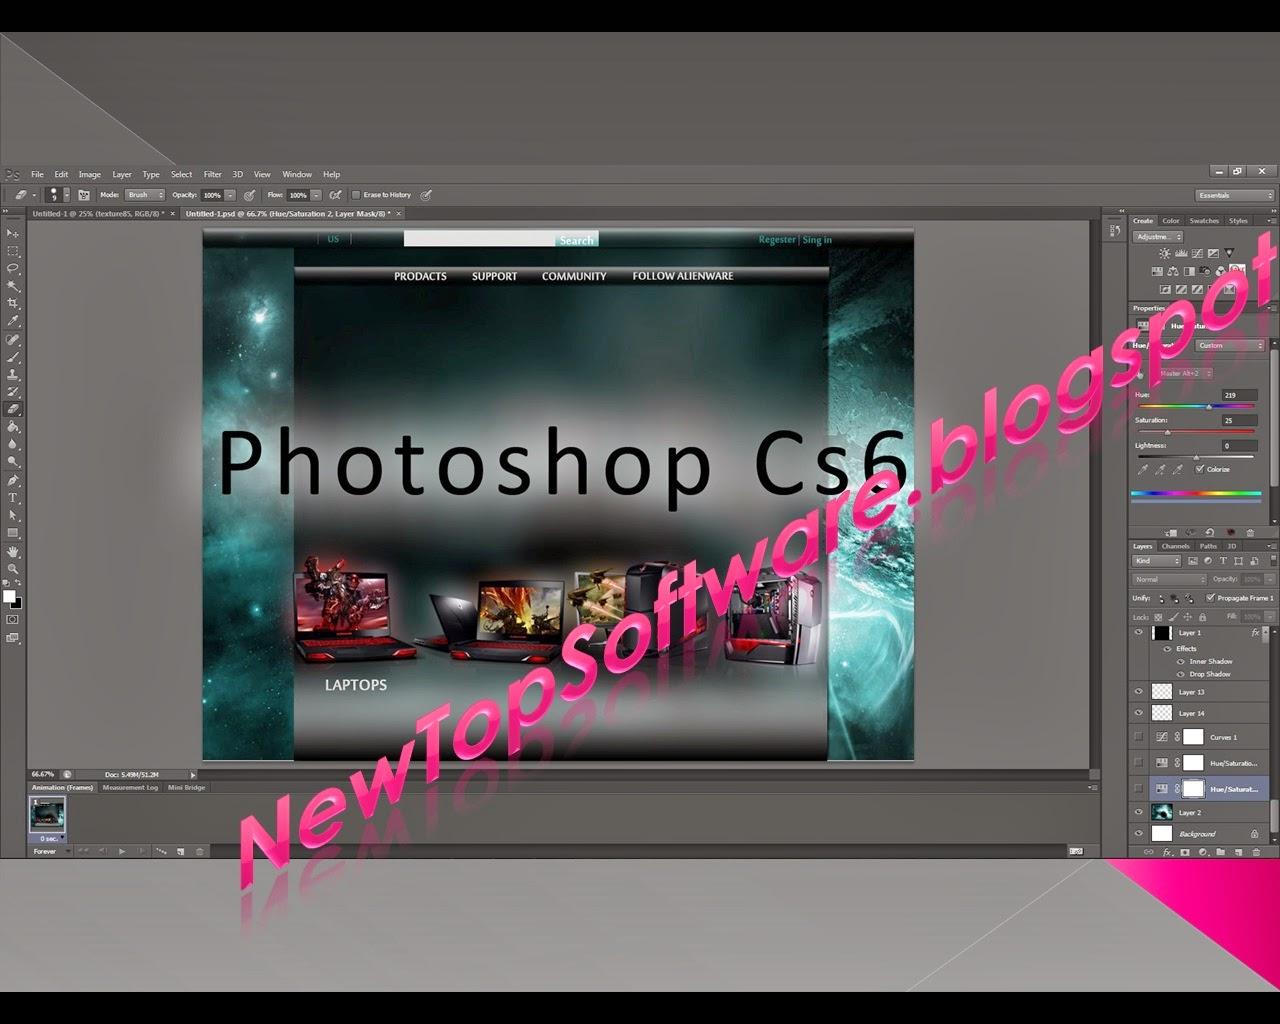 photoshop cs6 full version with crack